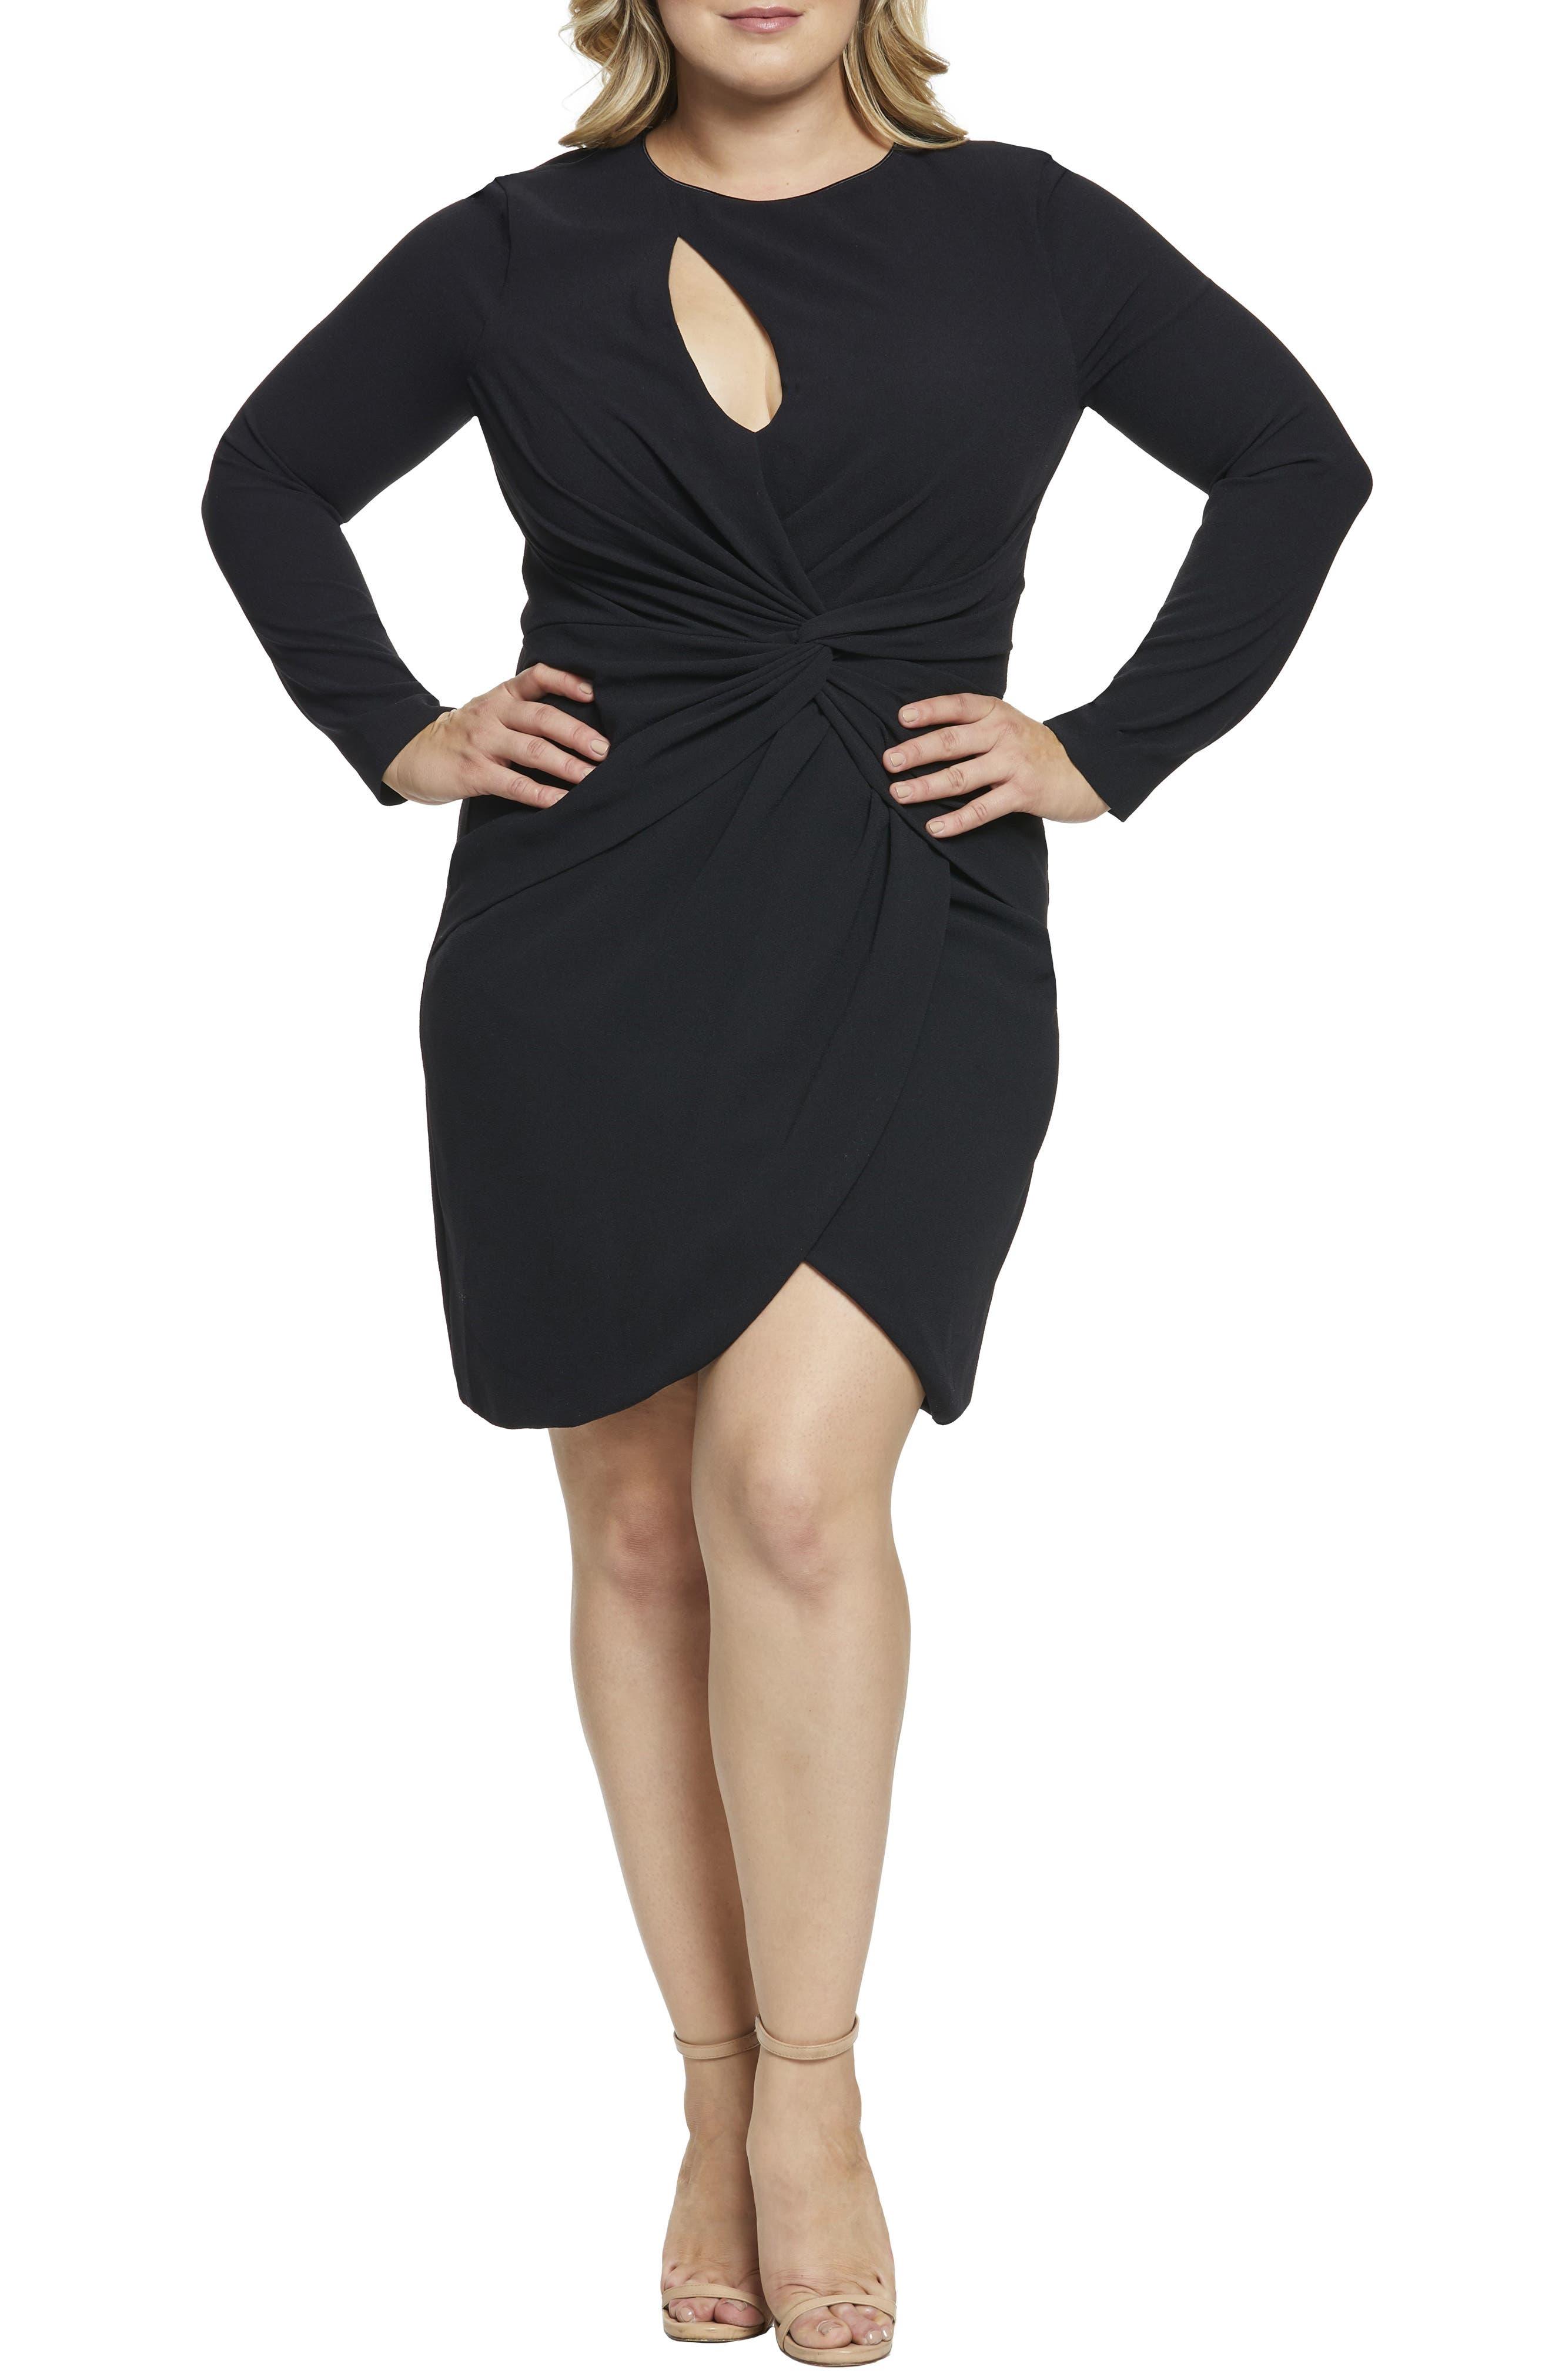 Plus Size Dress The Population Coby Twisted Faux Wrap Cocktail Dress, Black